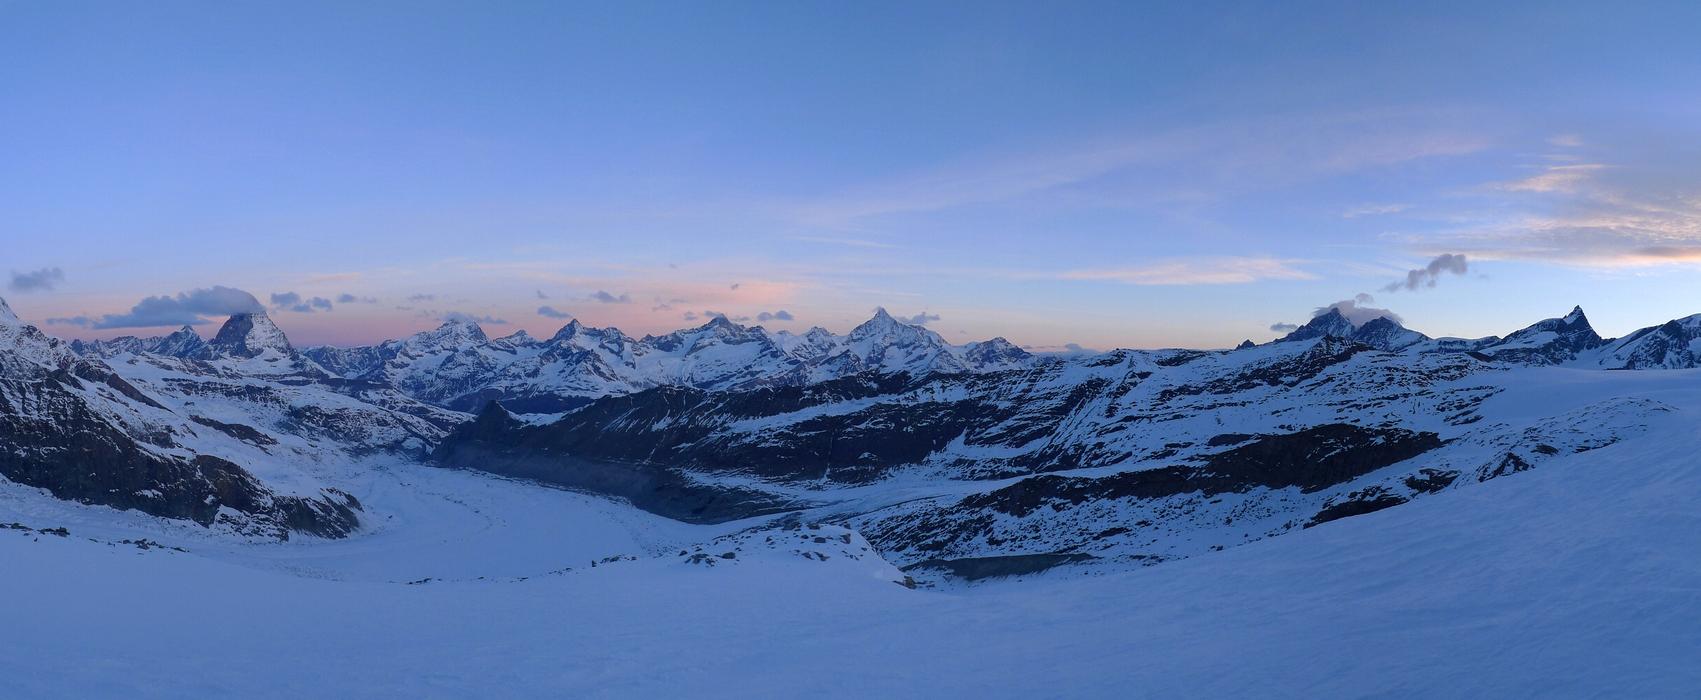 Nordend - Monte Rosa Walliser Alpen / Alpes valaisannes Švýcarsko panorama 18